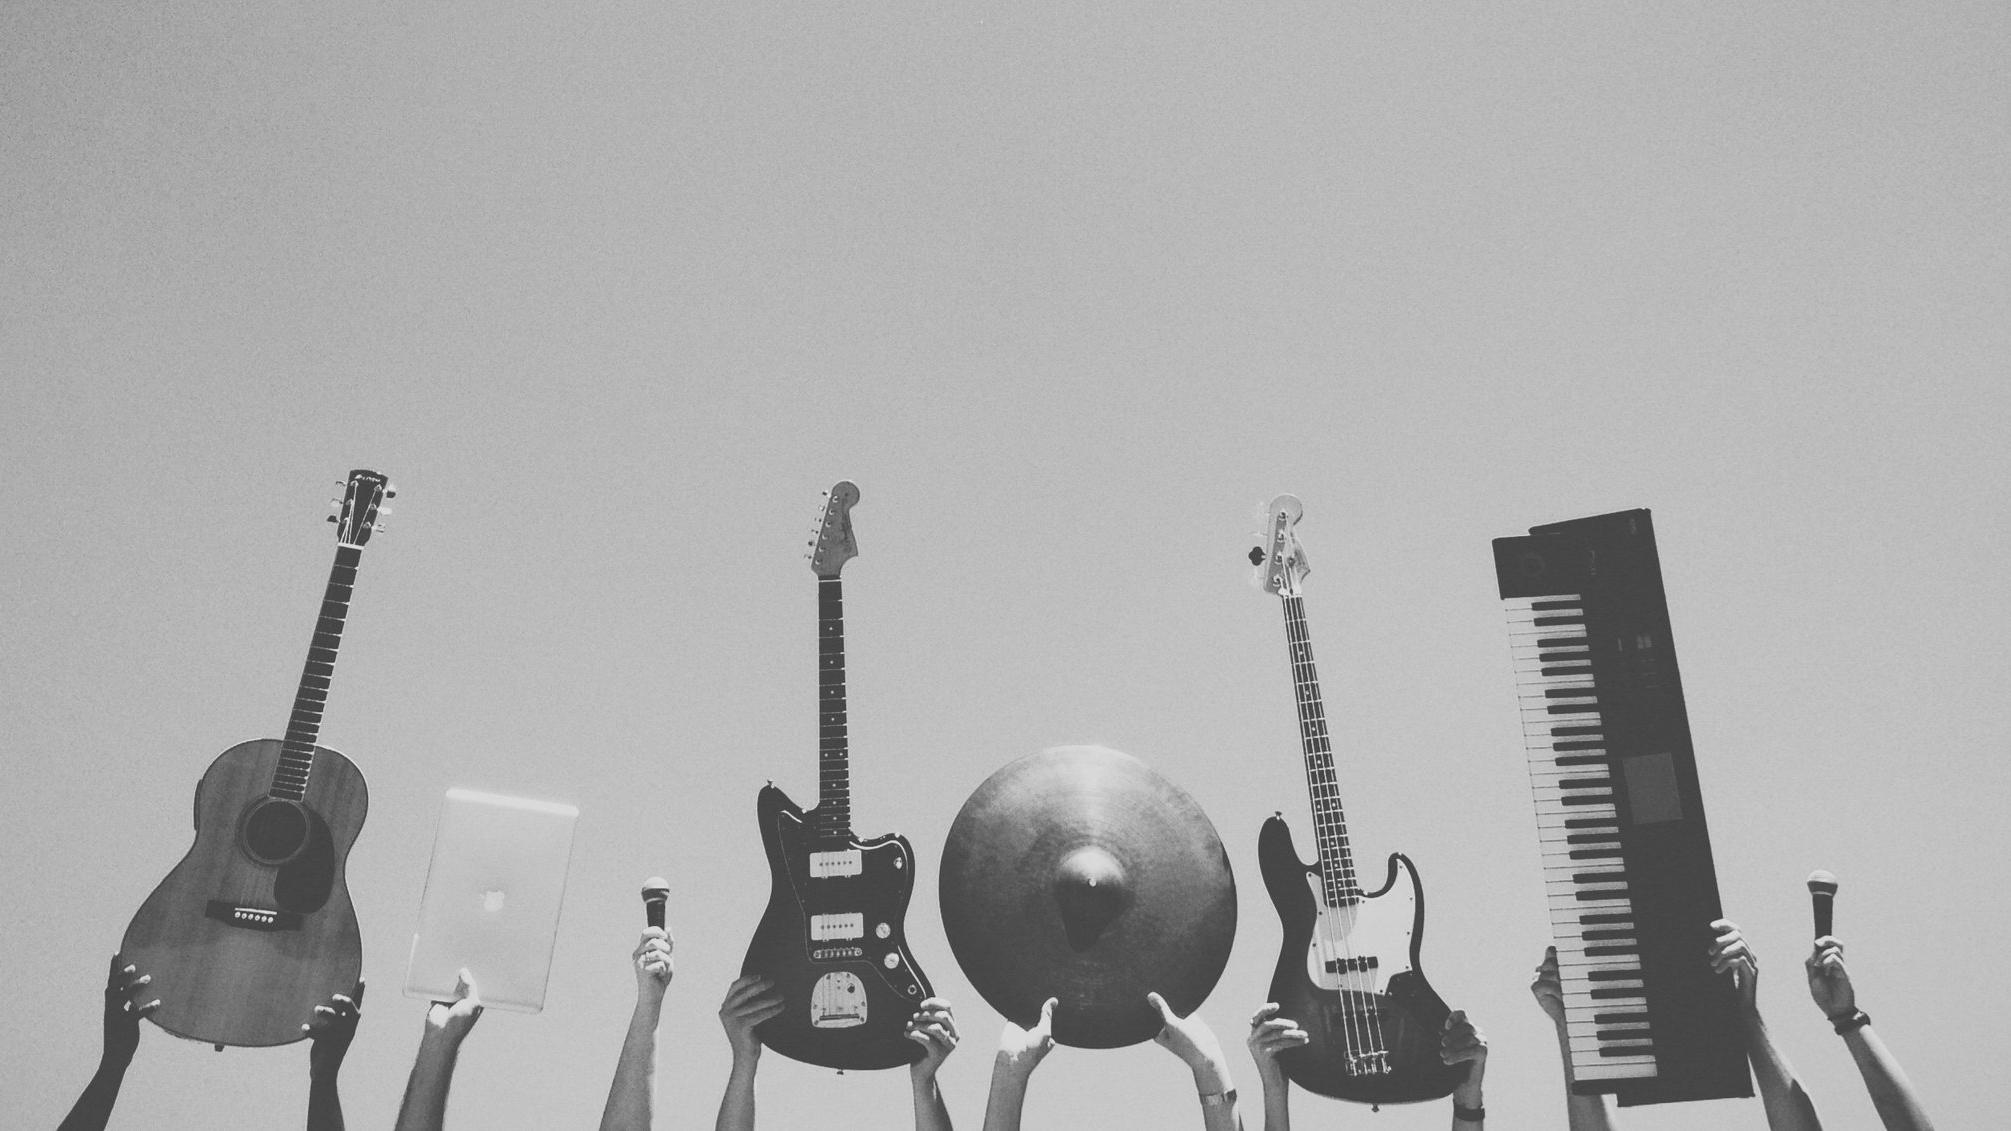 music-rock-guitars-musical-instruments-6966.jpg